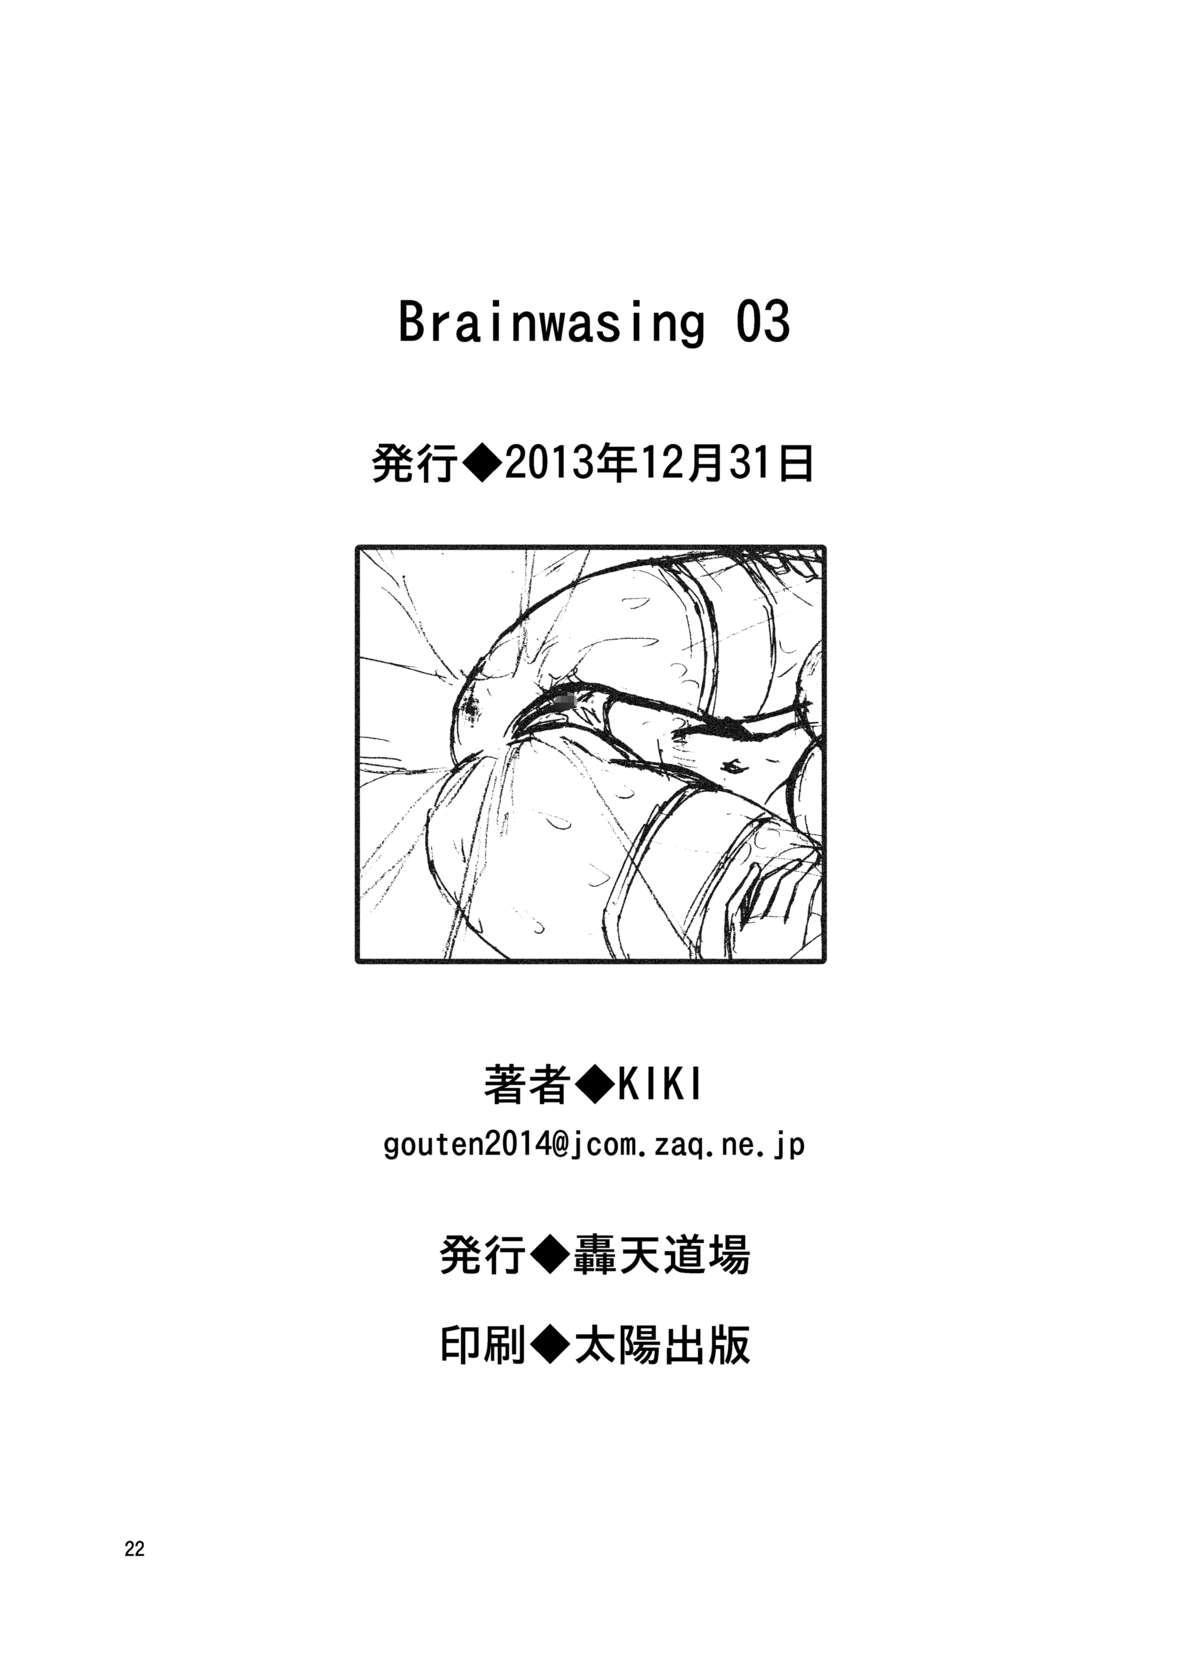 Brainwashing 03 21